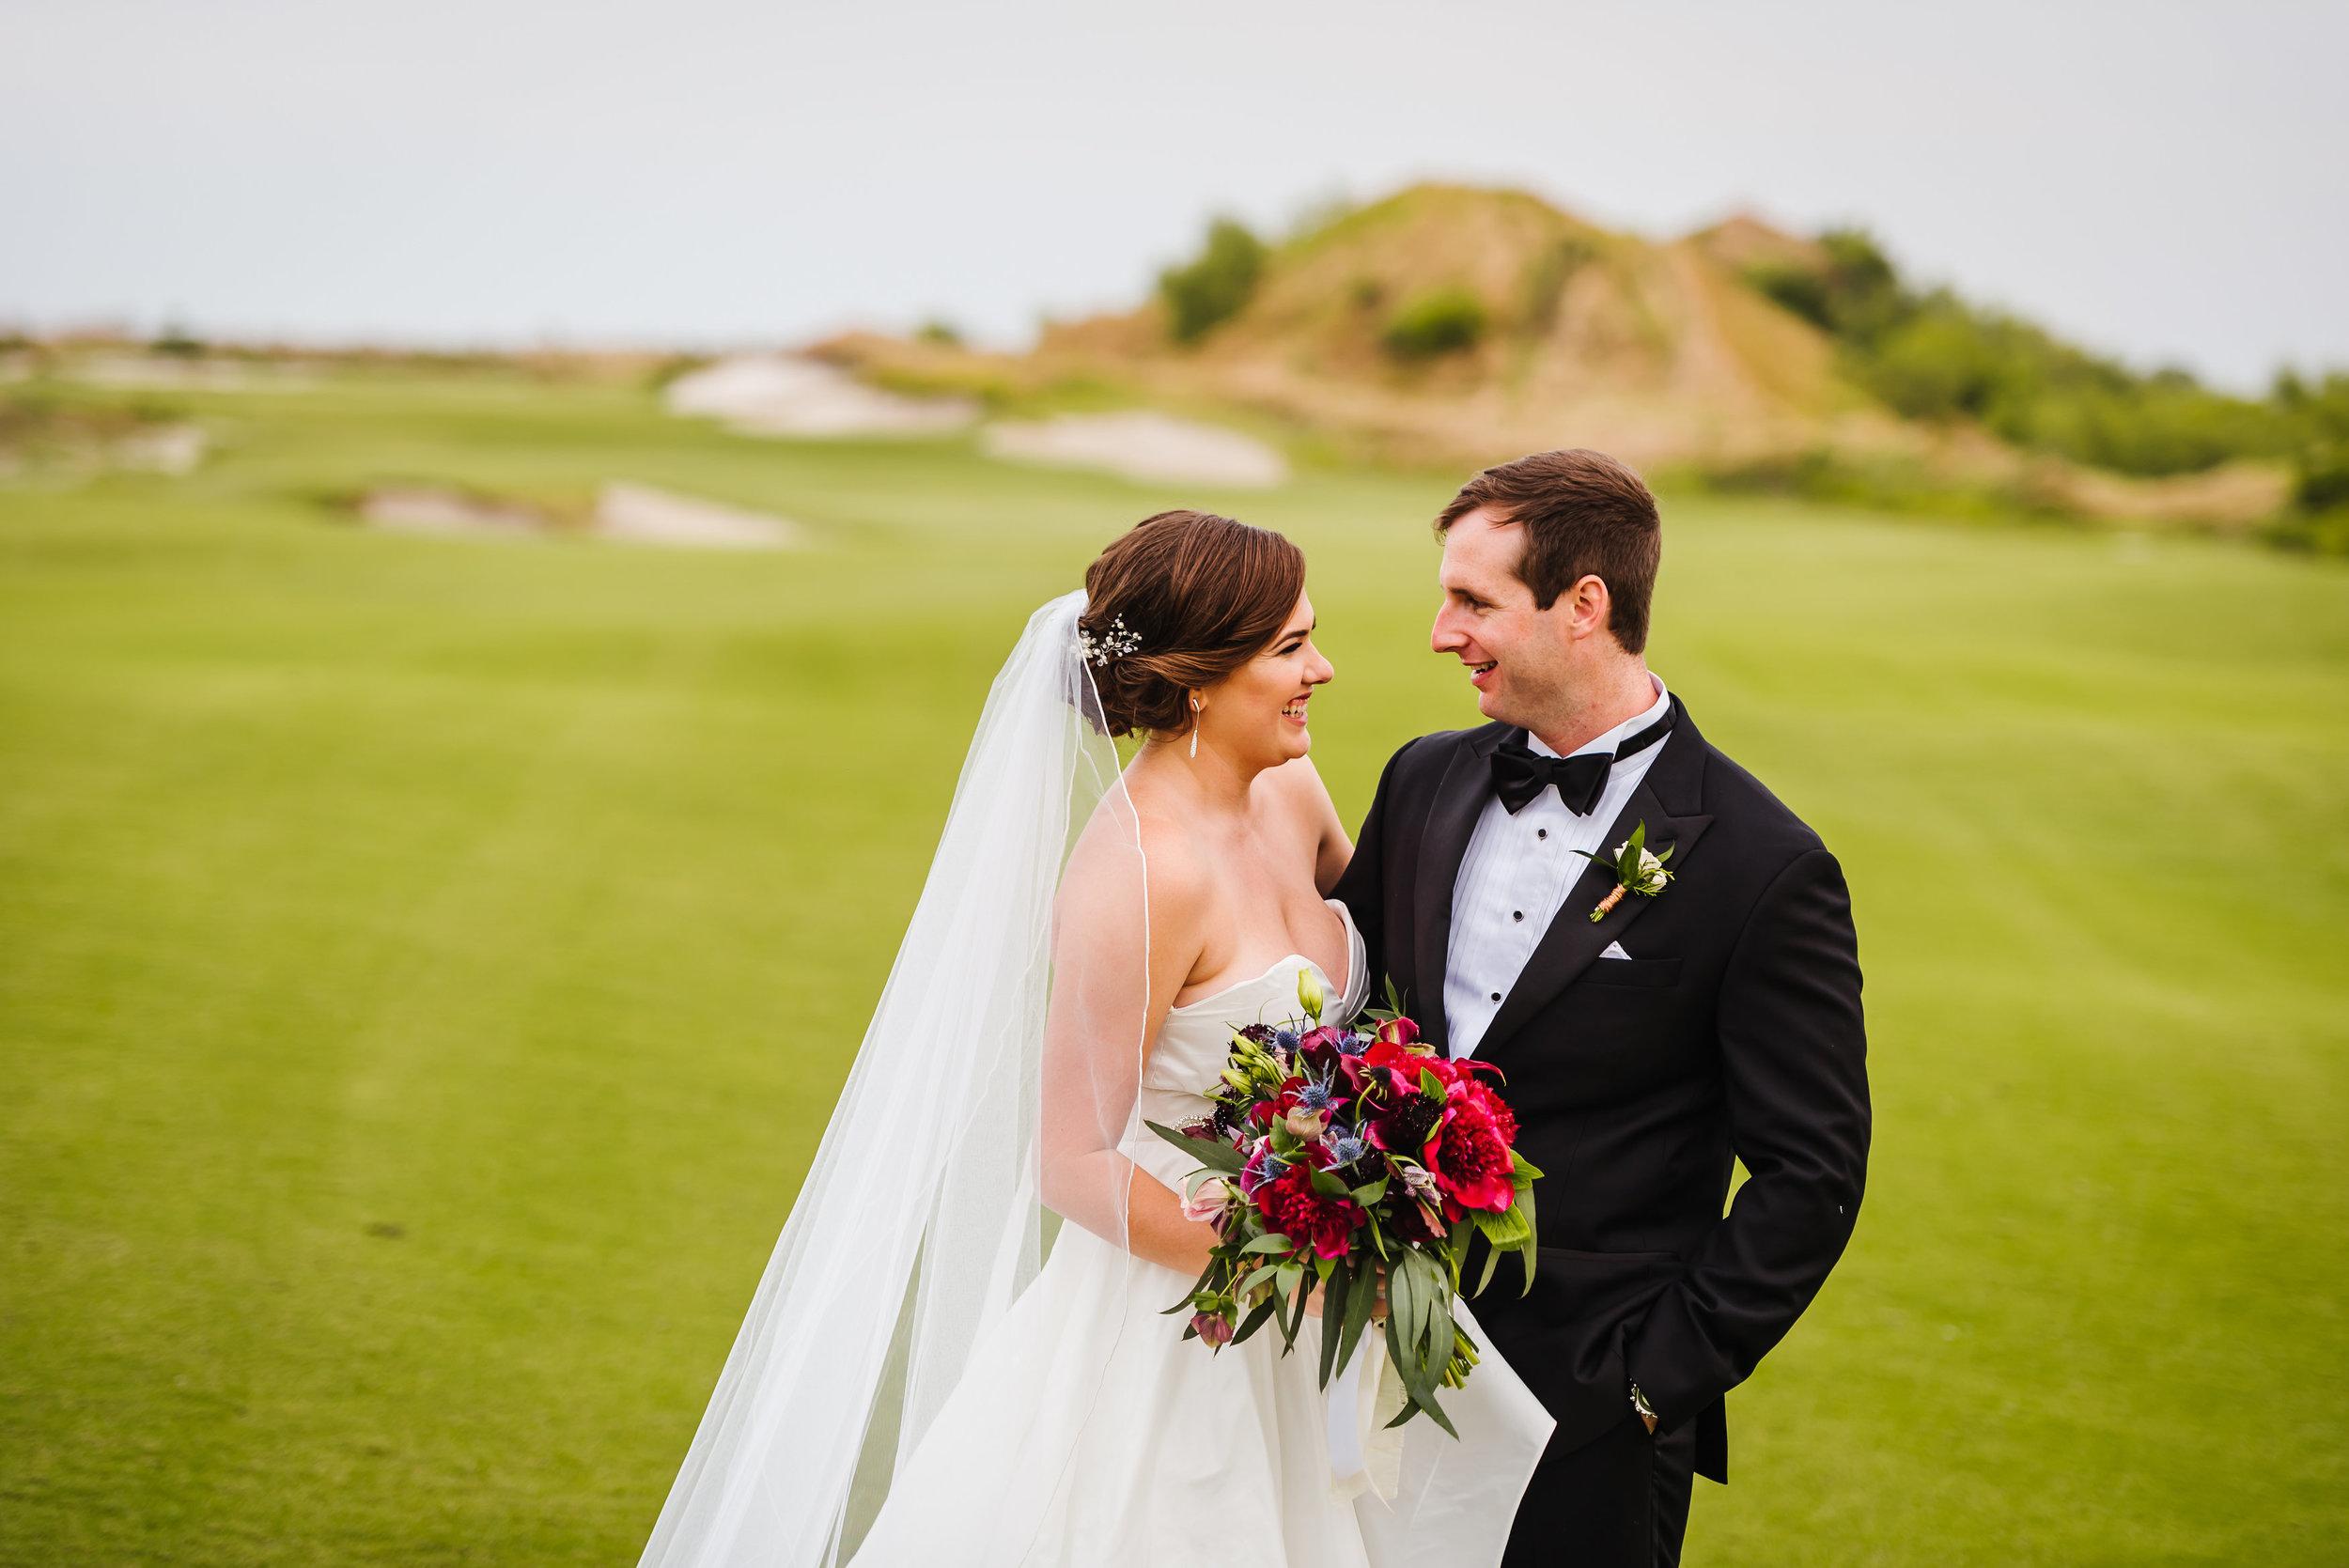 Tampa-Wedding-Photographer-Streamsong-Resort-Golf-Course-Bouquet.jpg